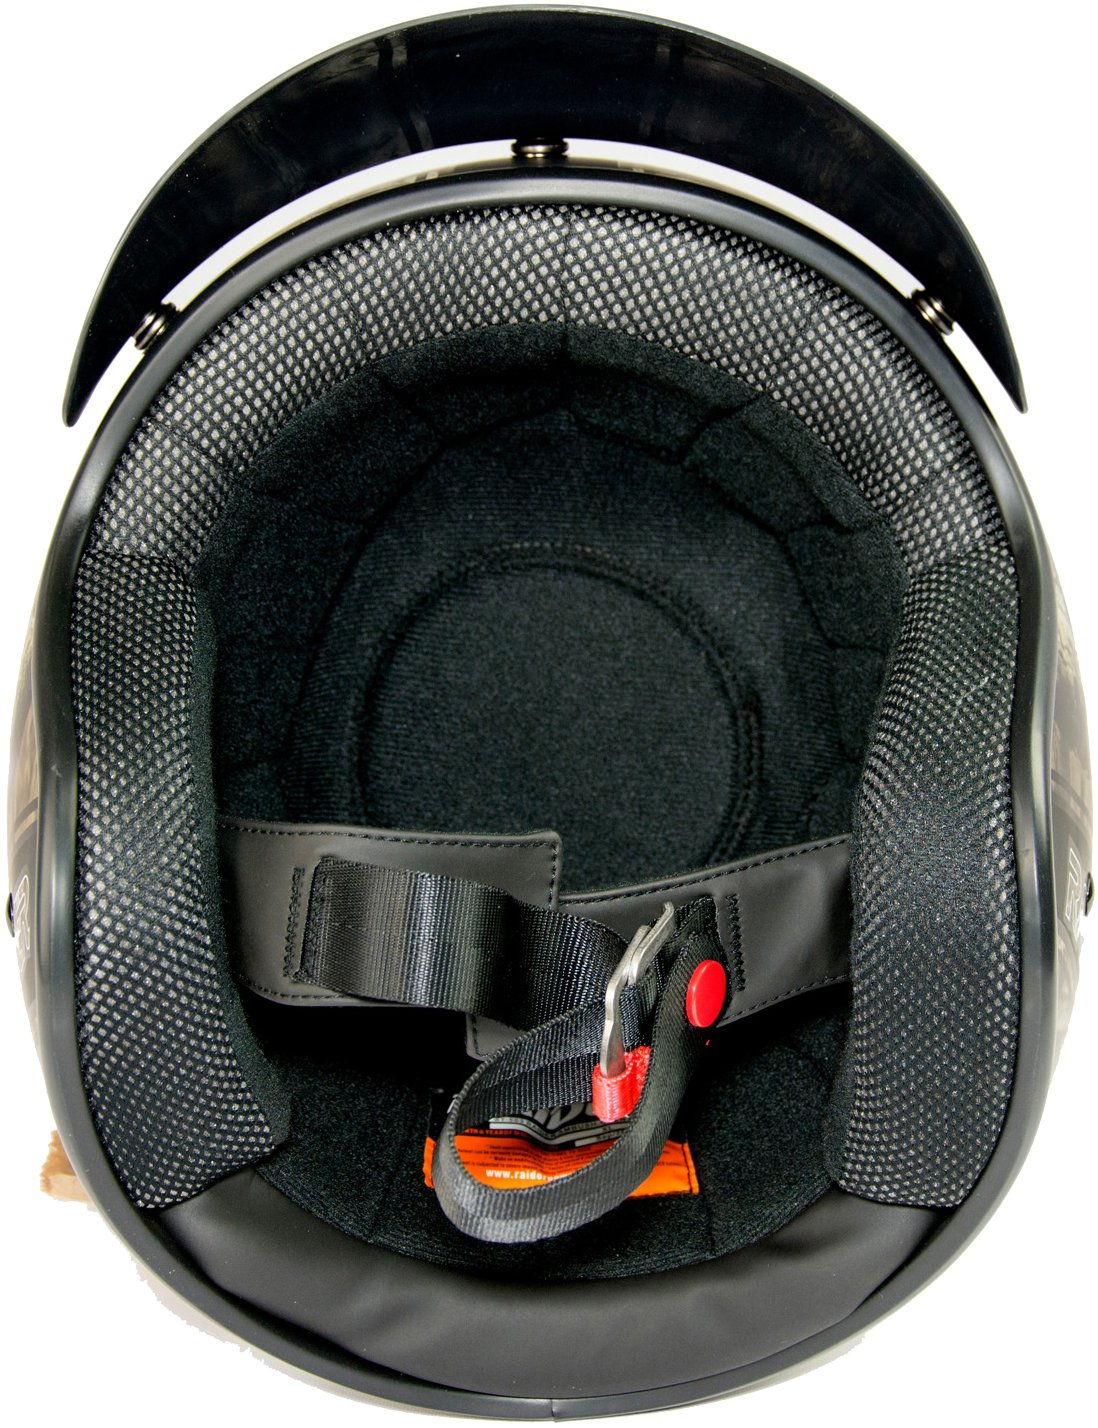 Raider 24-632MO-16 Ambush Adult Open Face Helmet Mossy Oak Break Up Infinity X-Large